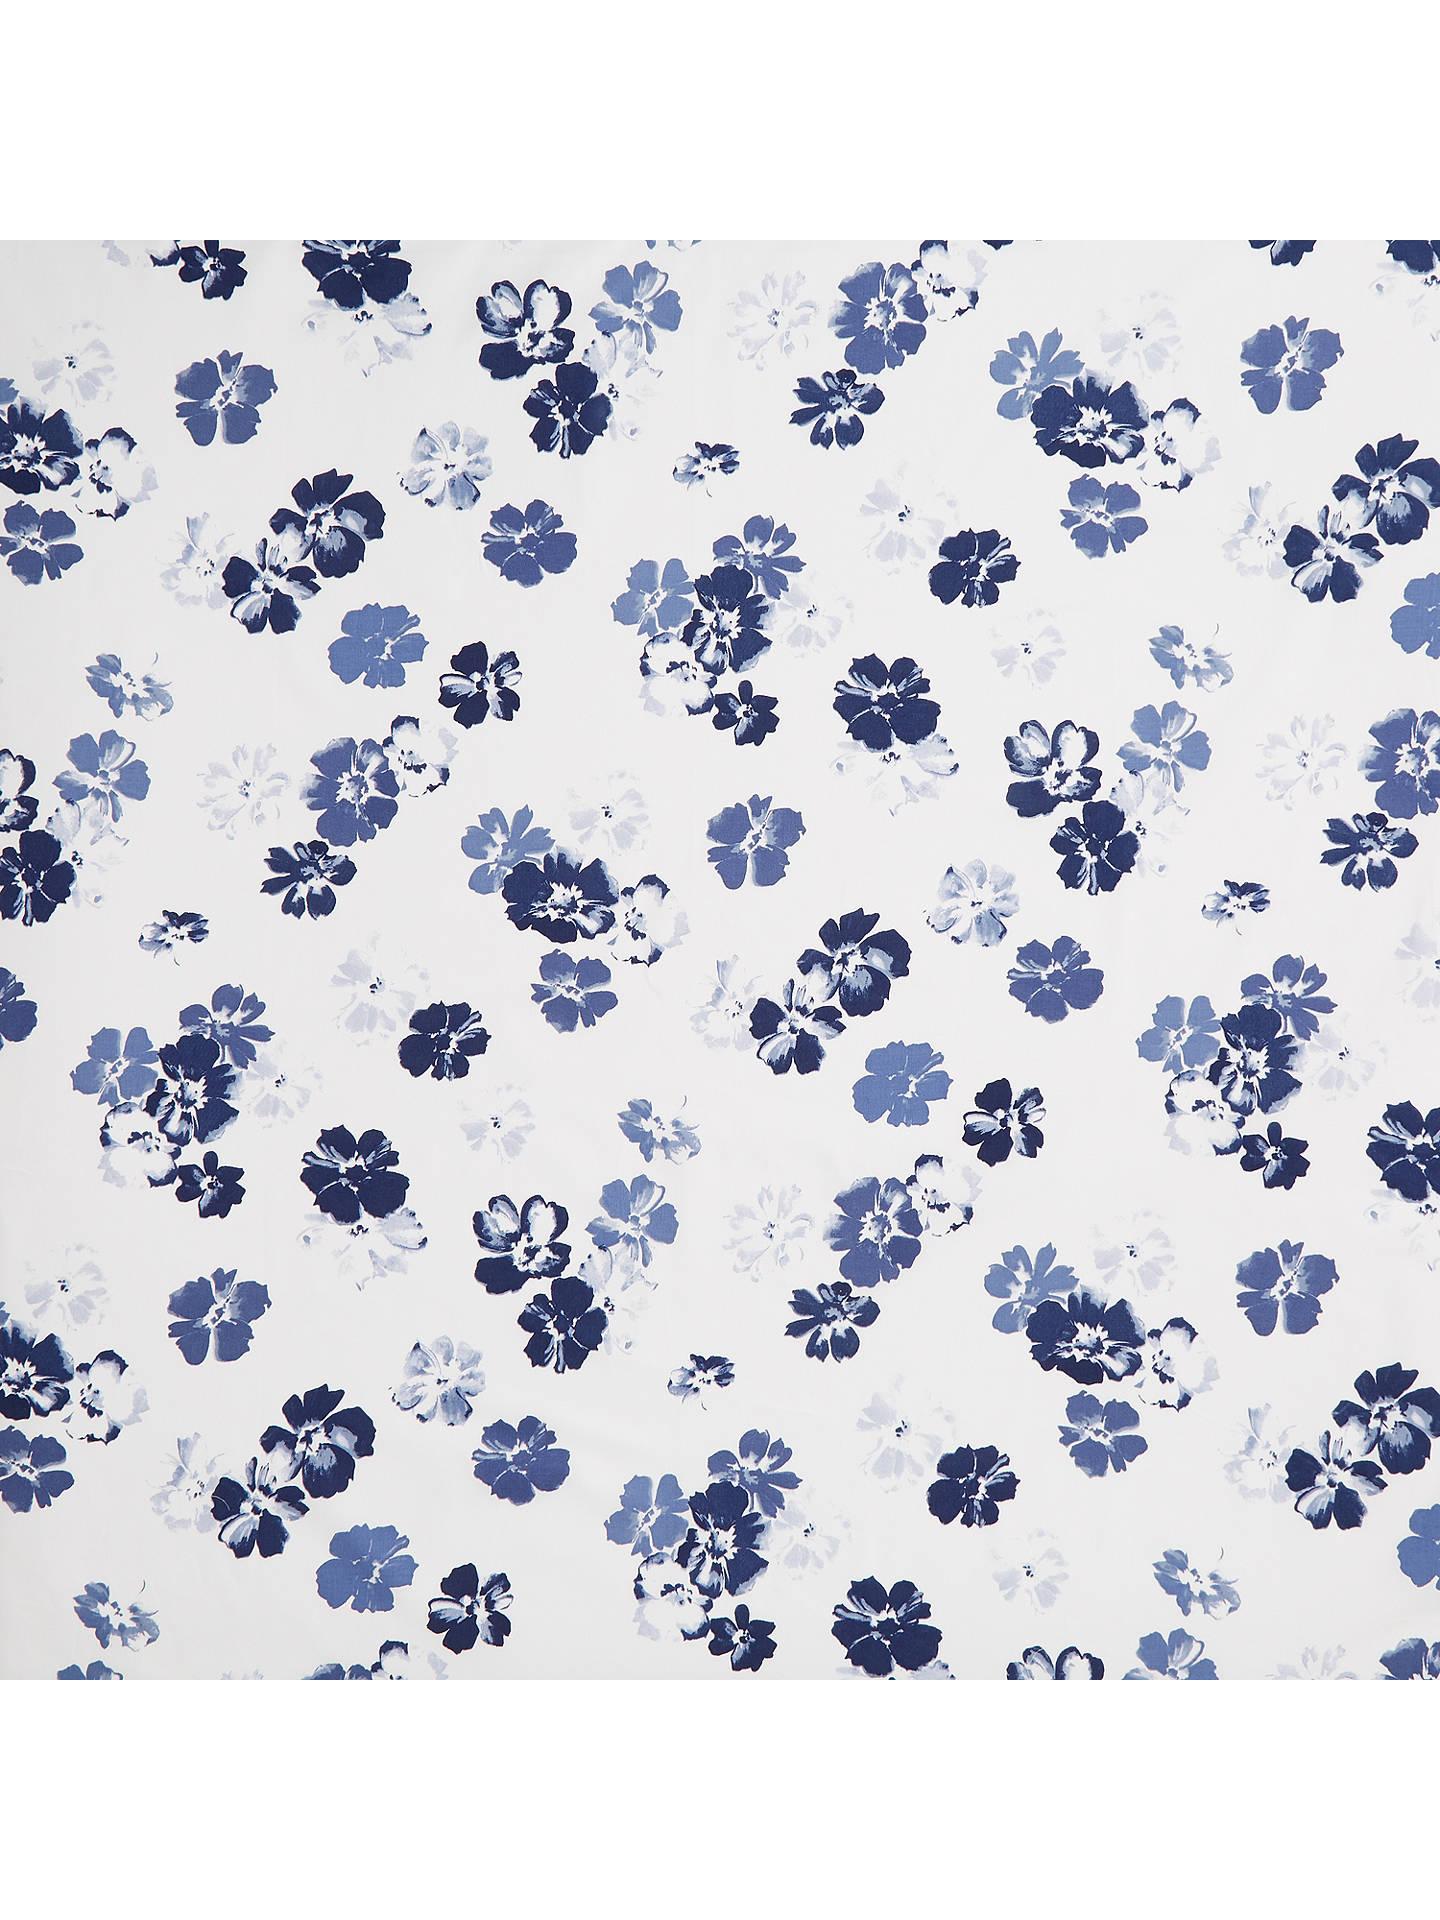 Kokka Tonal Oversized Flower Fabric At John Lewis Partners